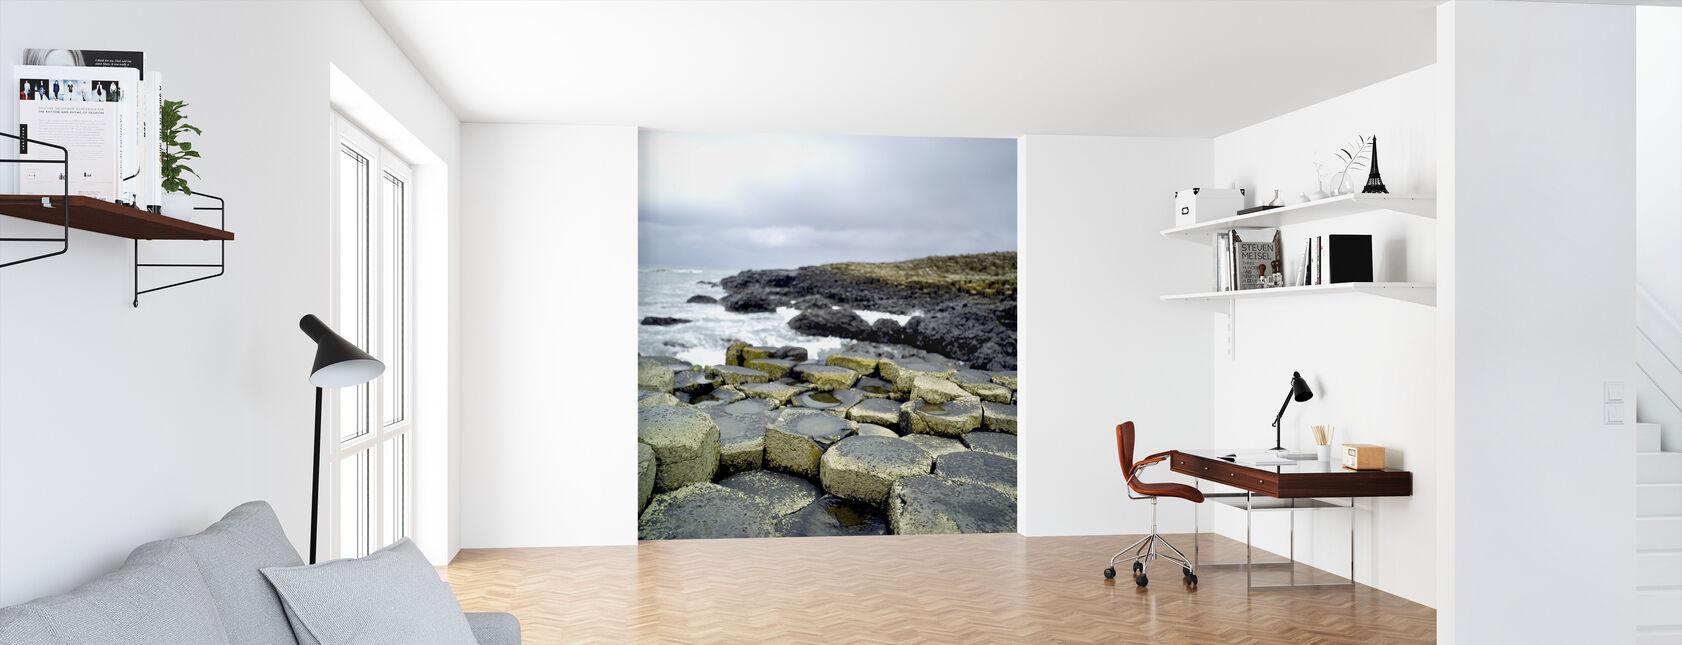 Giants Causeway - Wallpaper - Office